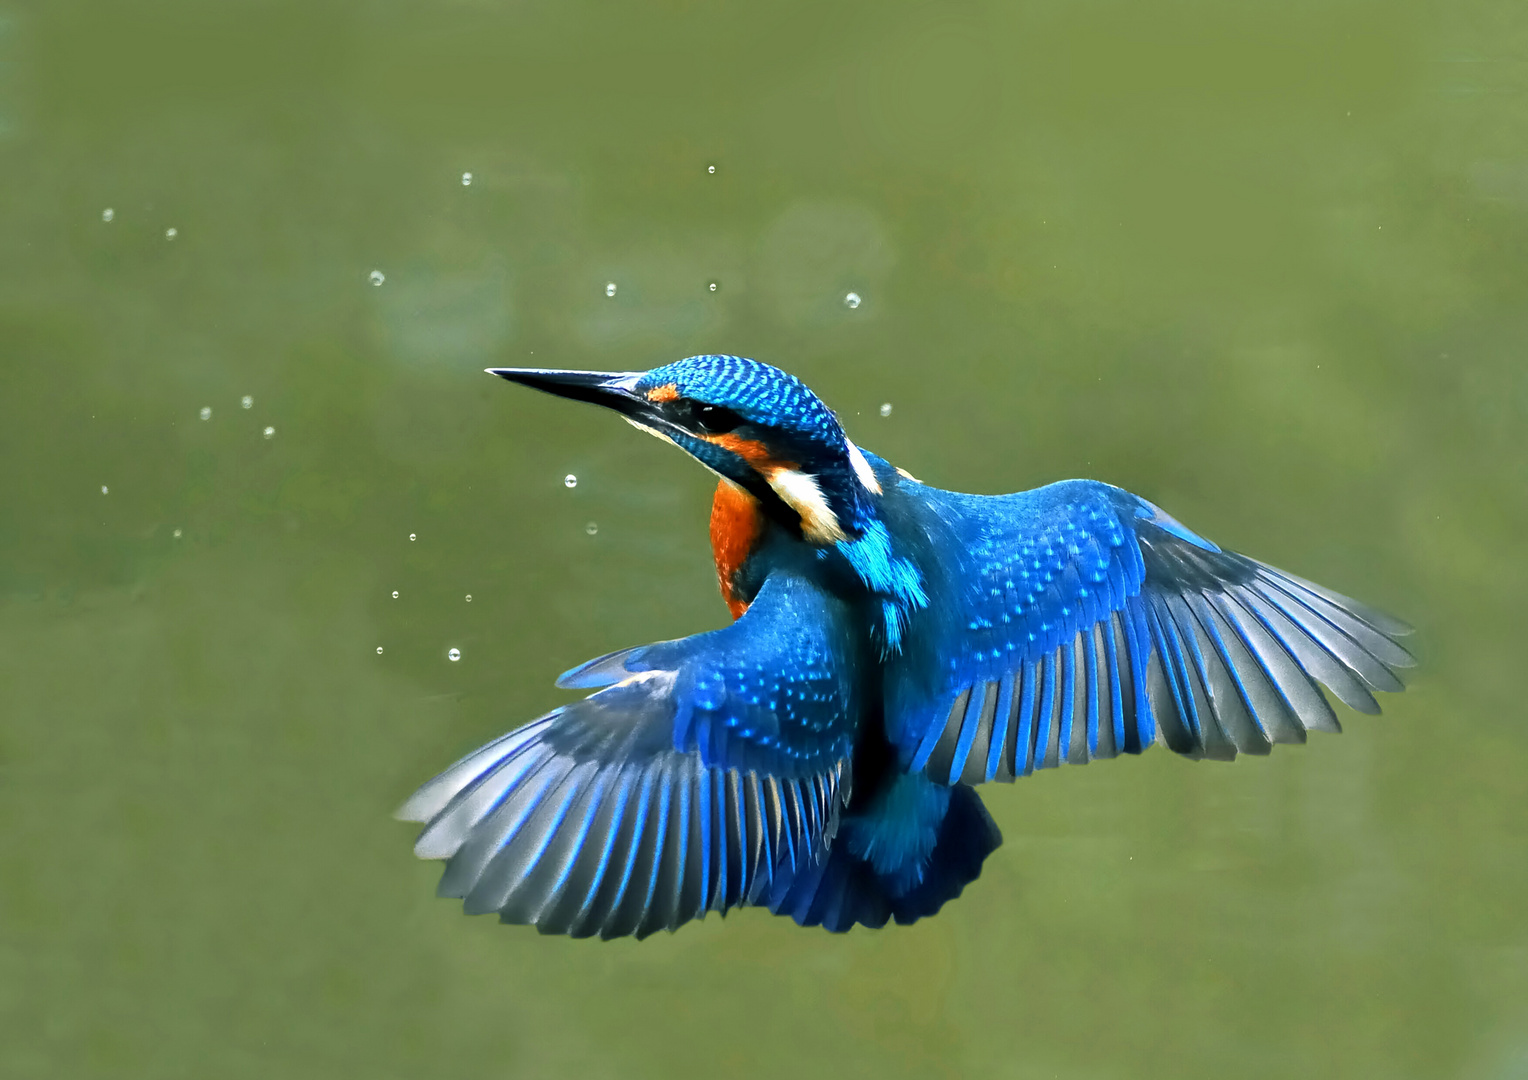 Eisvogel im Schwebflug